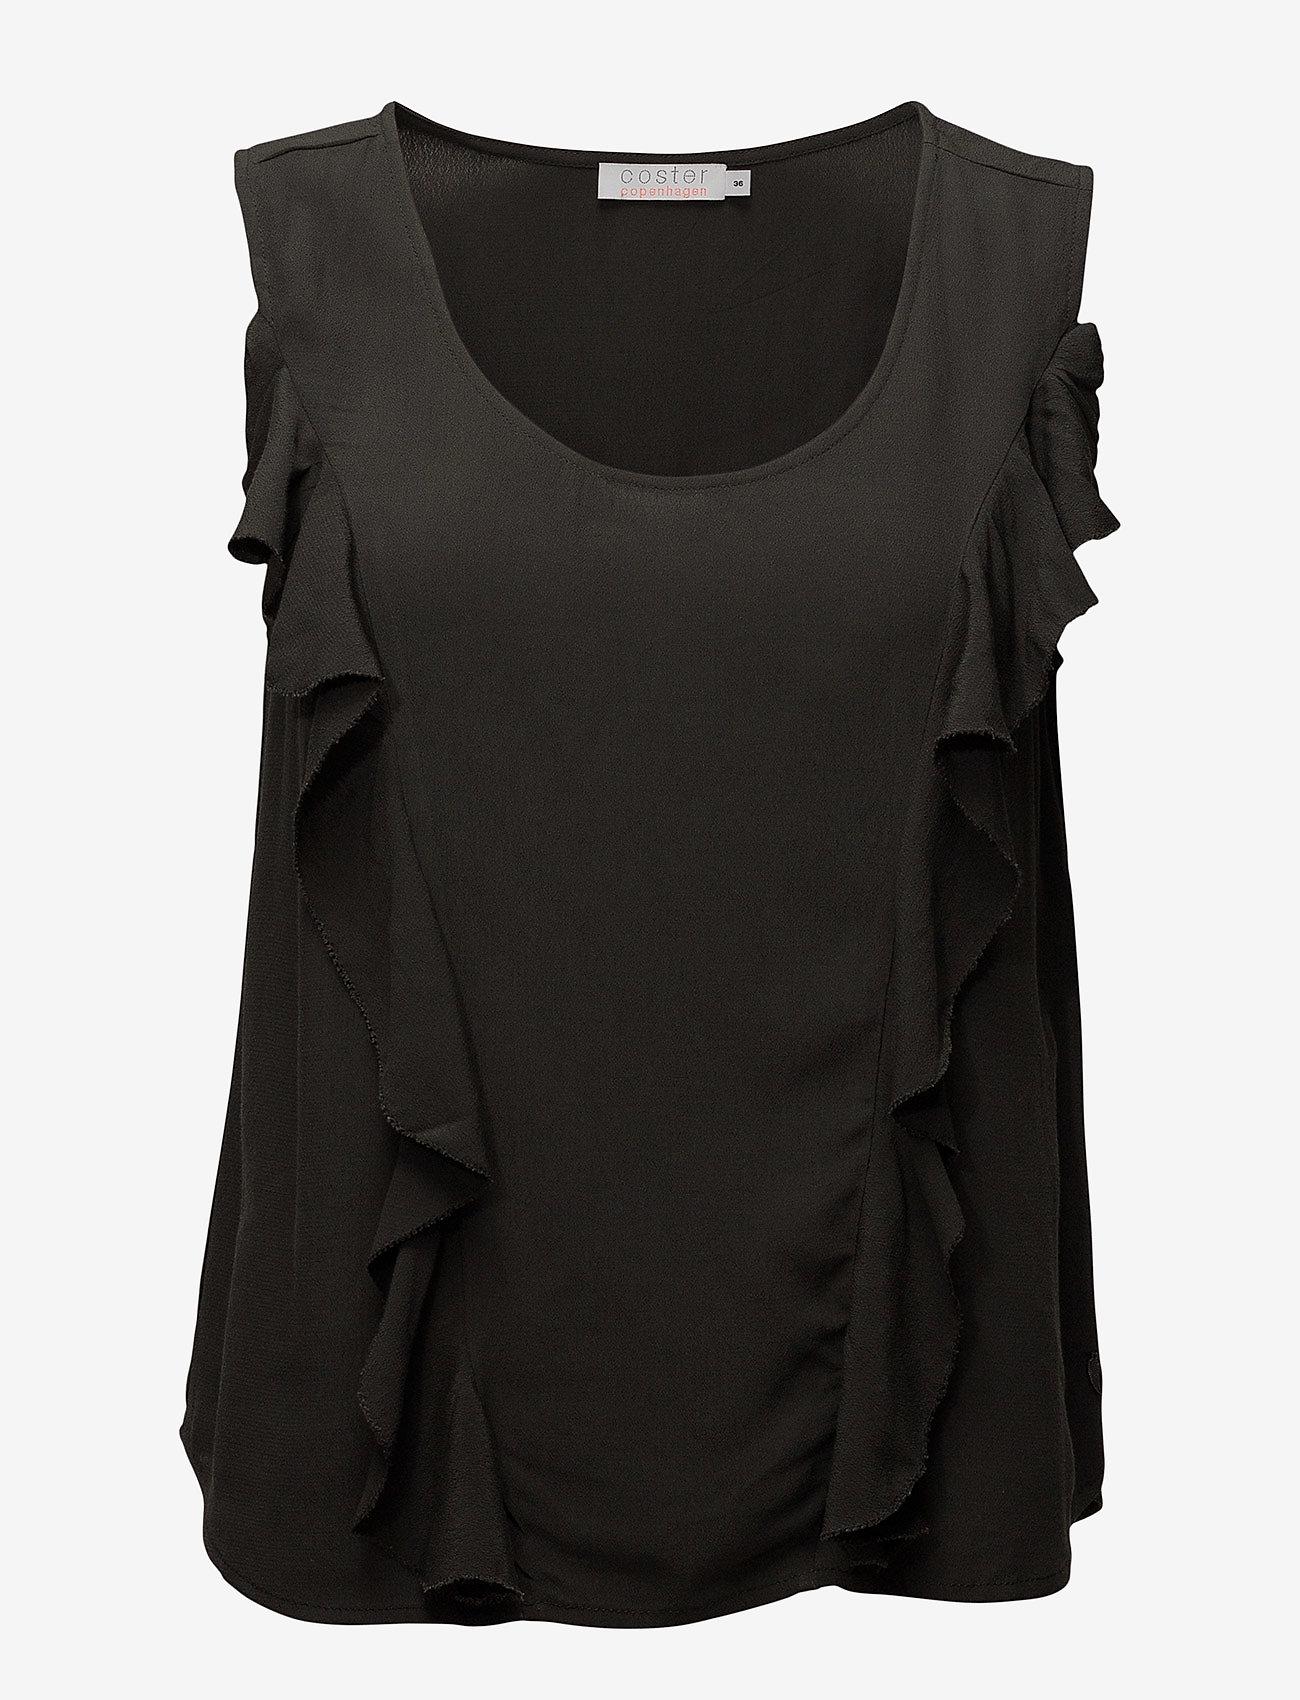 Coster Copenhagen - Top w. front ruffle - sleeveless blouses - stone green